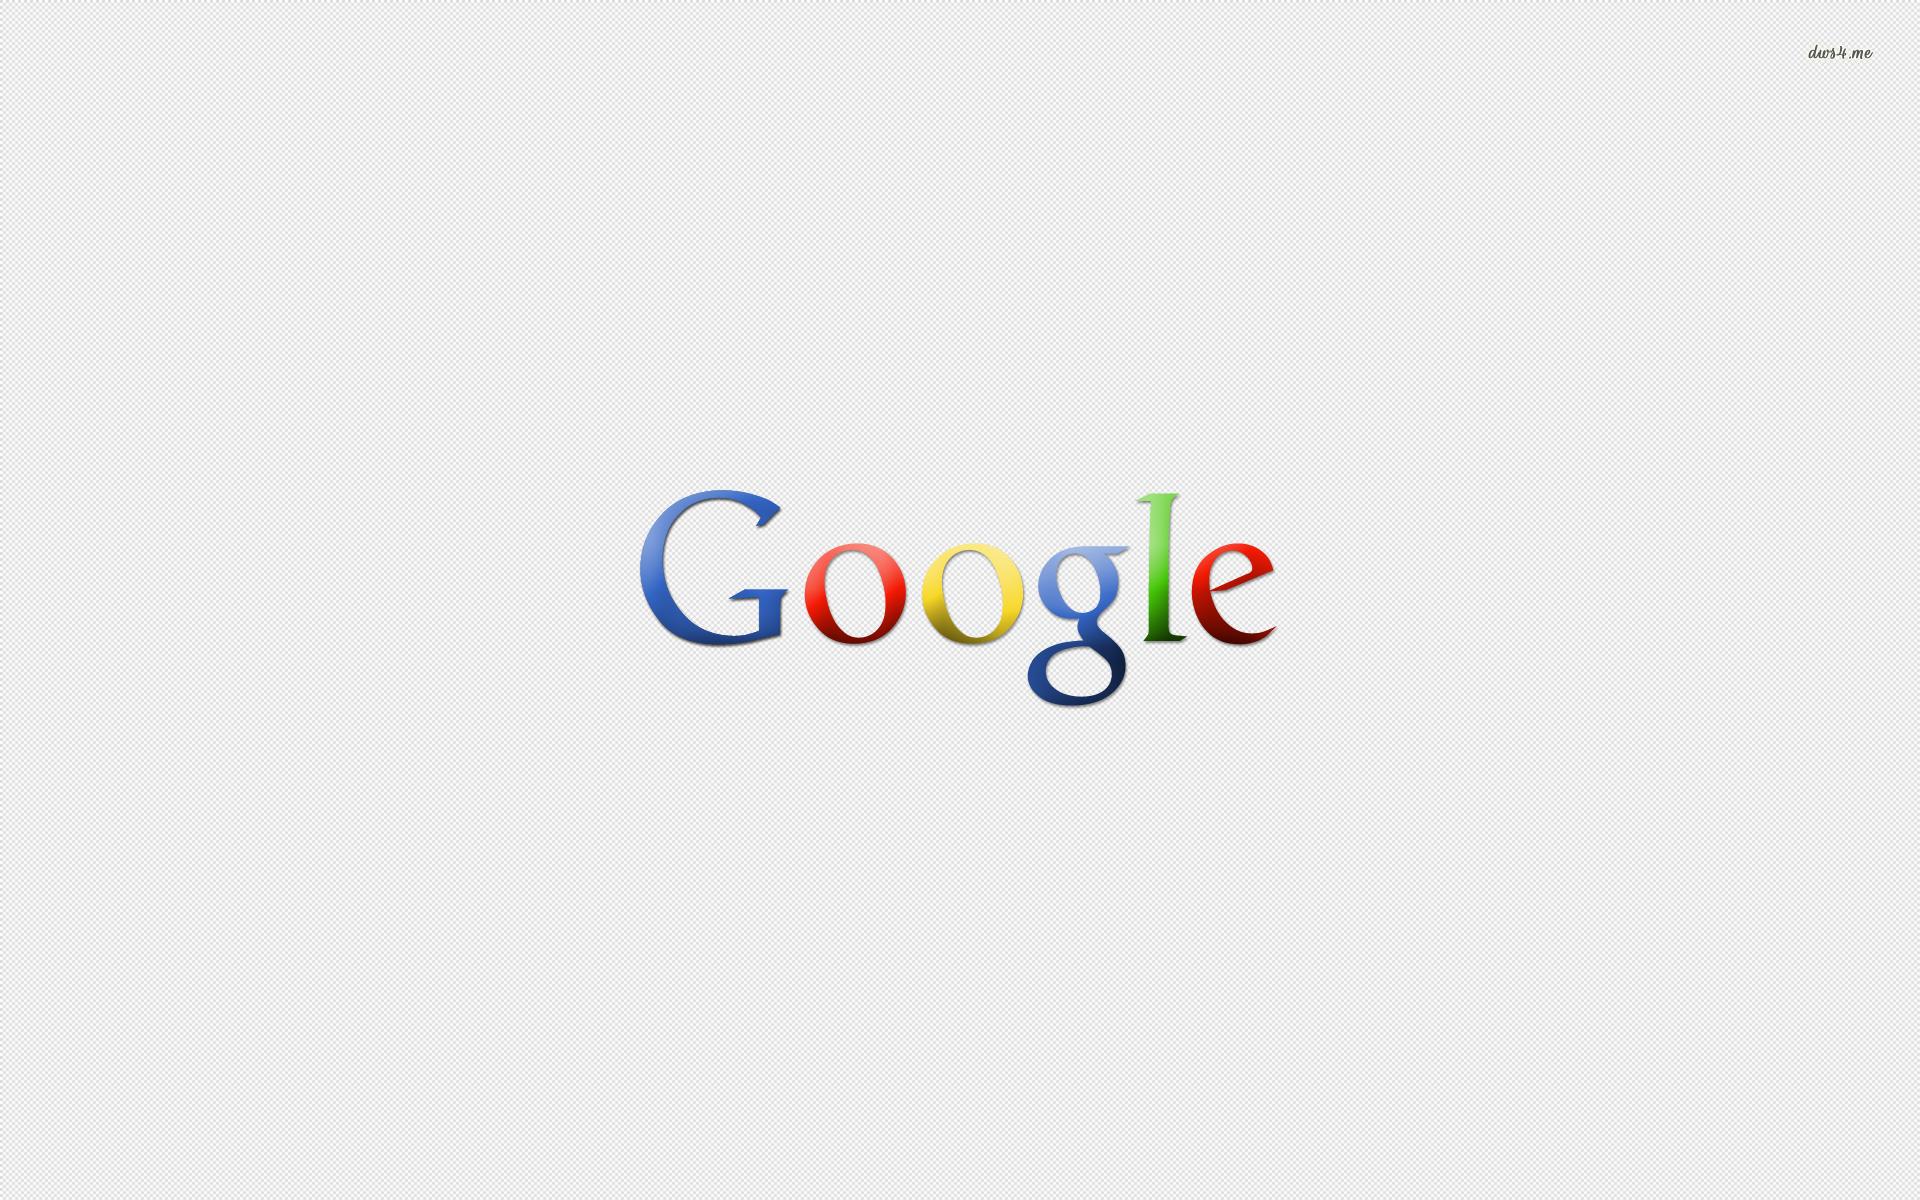 Google wallpaper   Computer wallpapers   7777 1920x1200